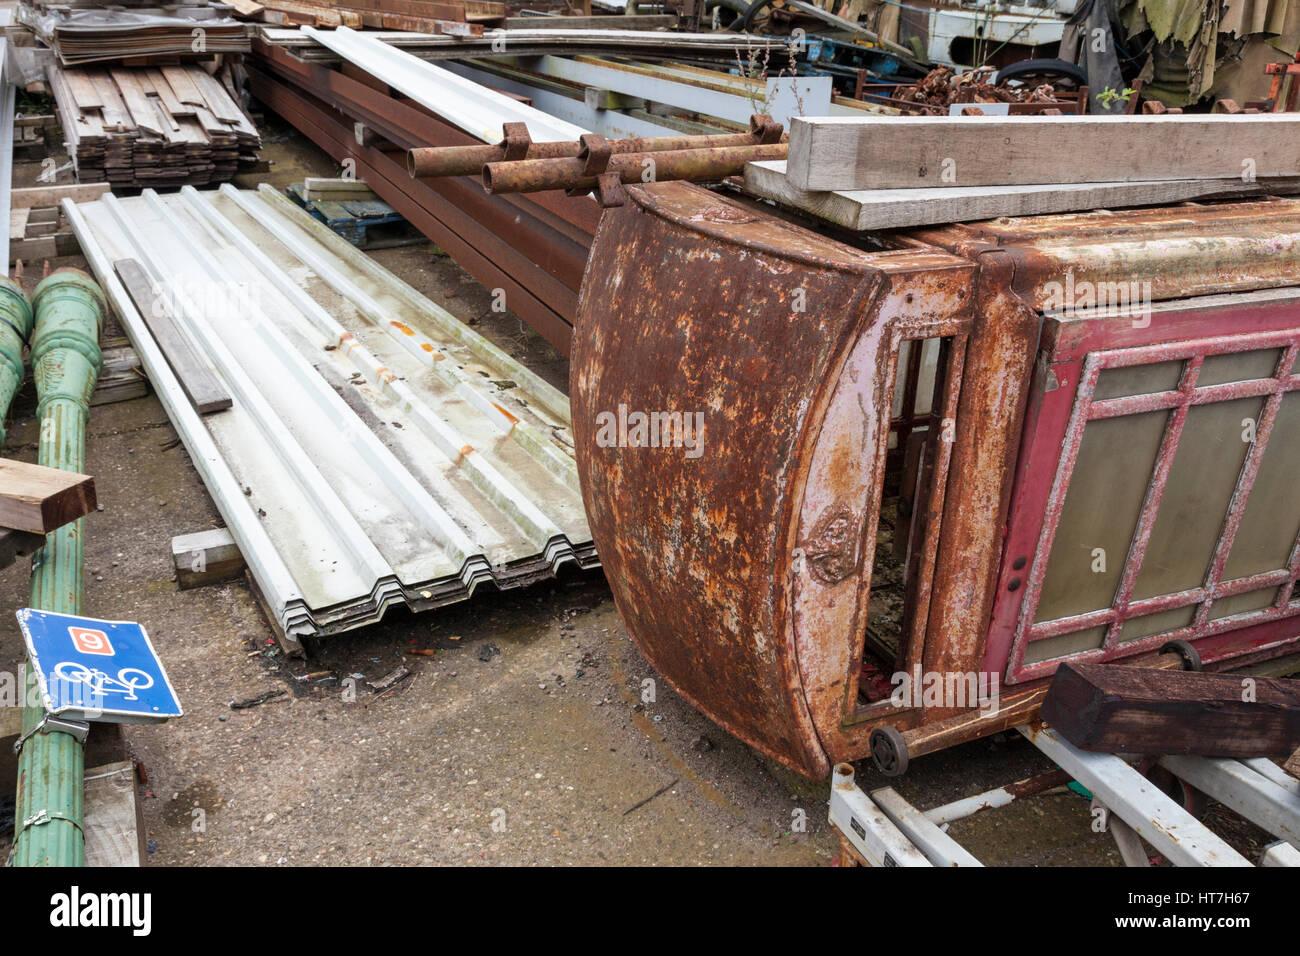 Sorted scrap metal, England, UK - Stock Image